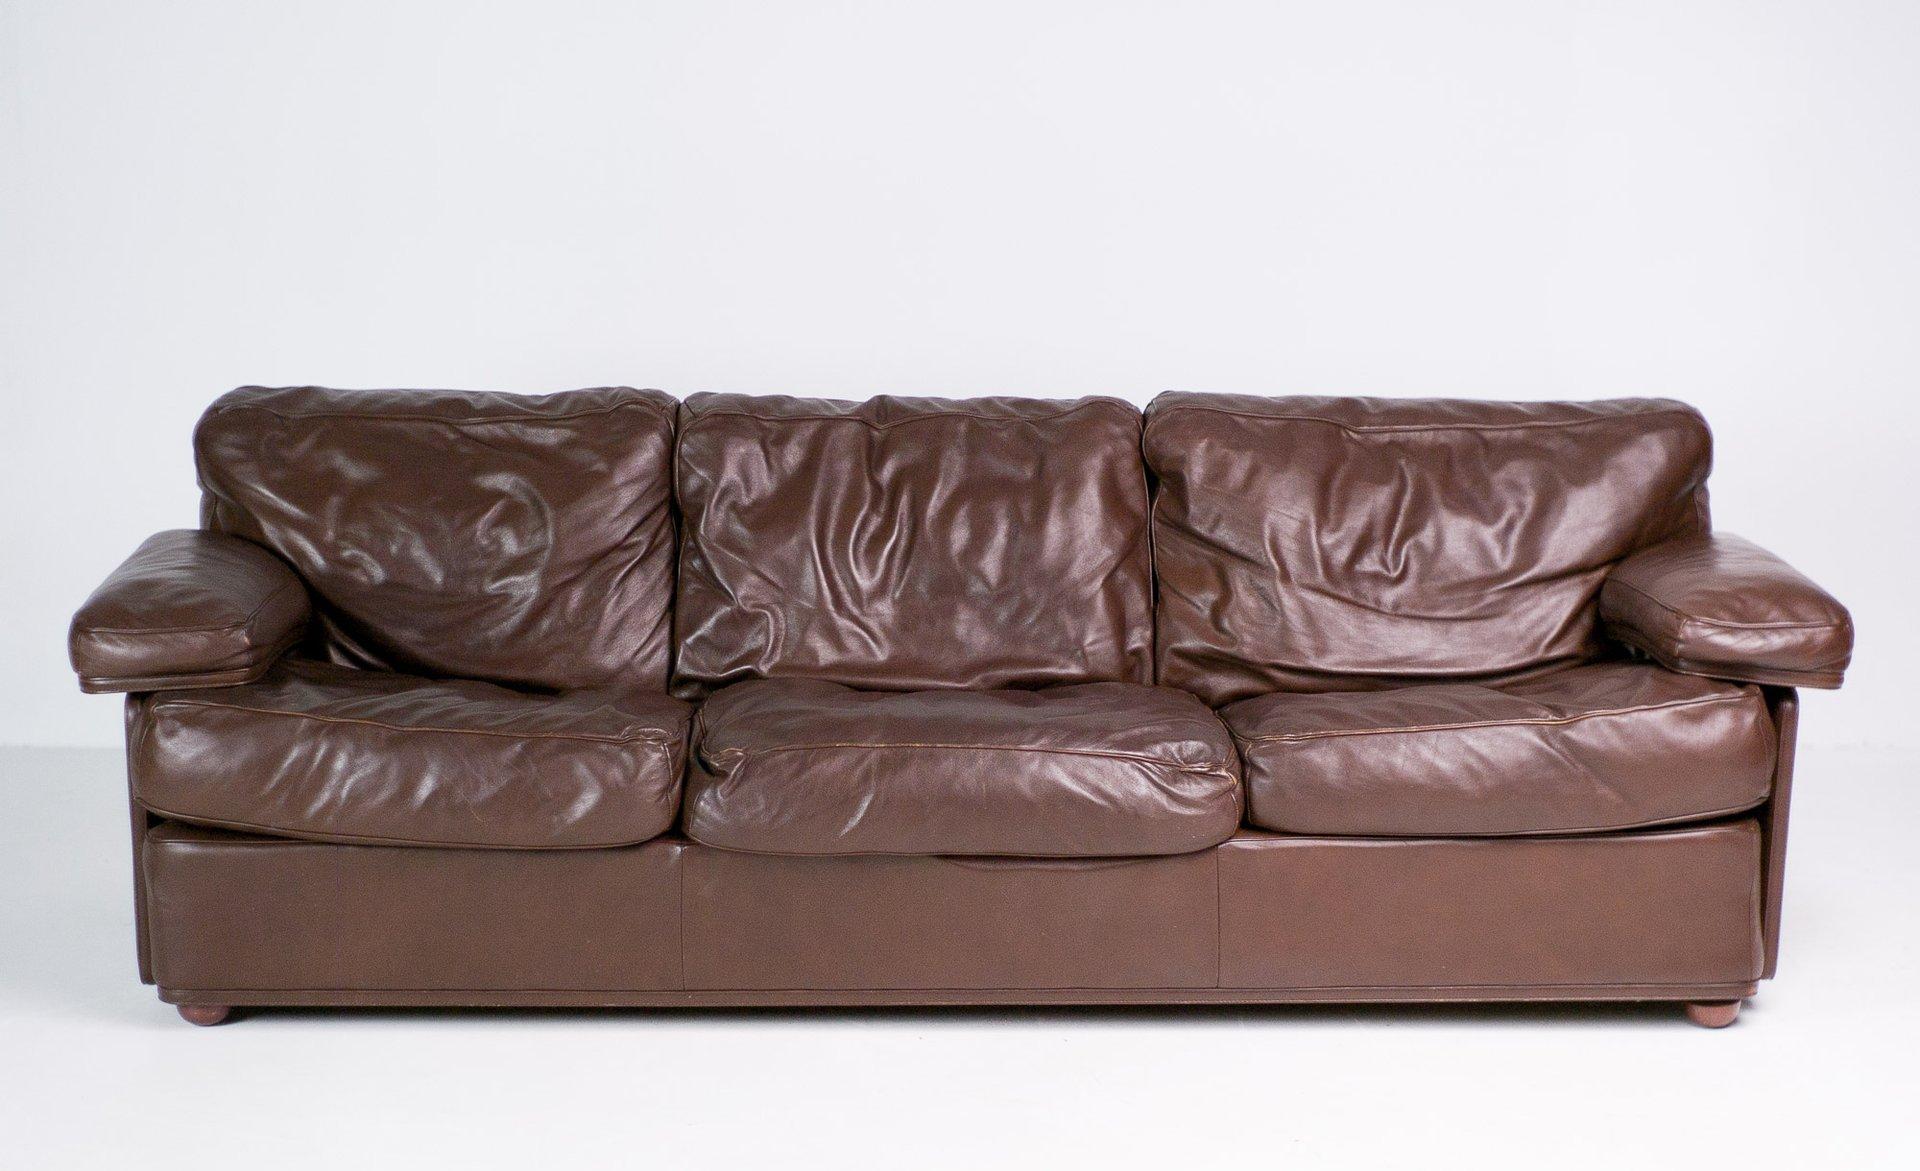 Poltrona Frau.Italian Modern Sofa By Tito Agnoli For Poltrona Frau For Sale At Pamono